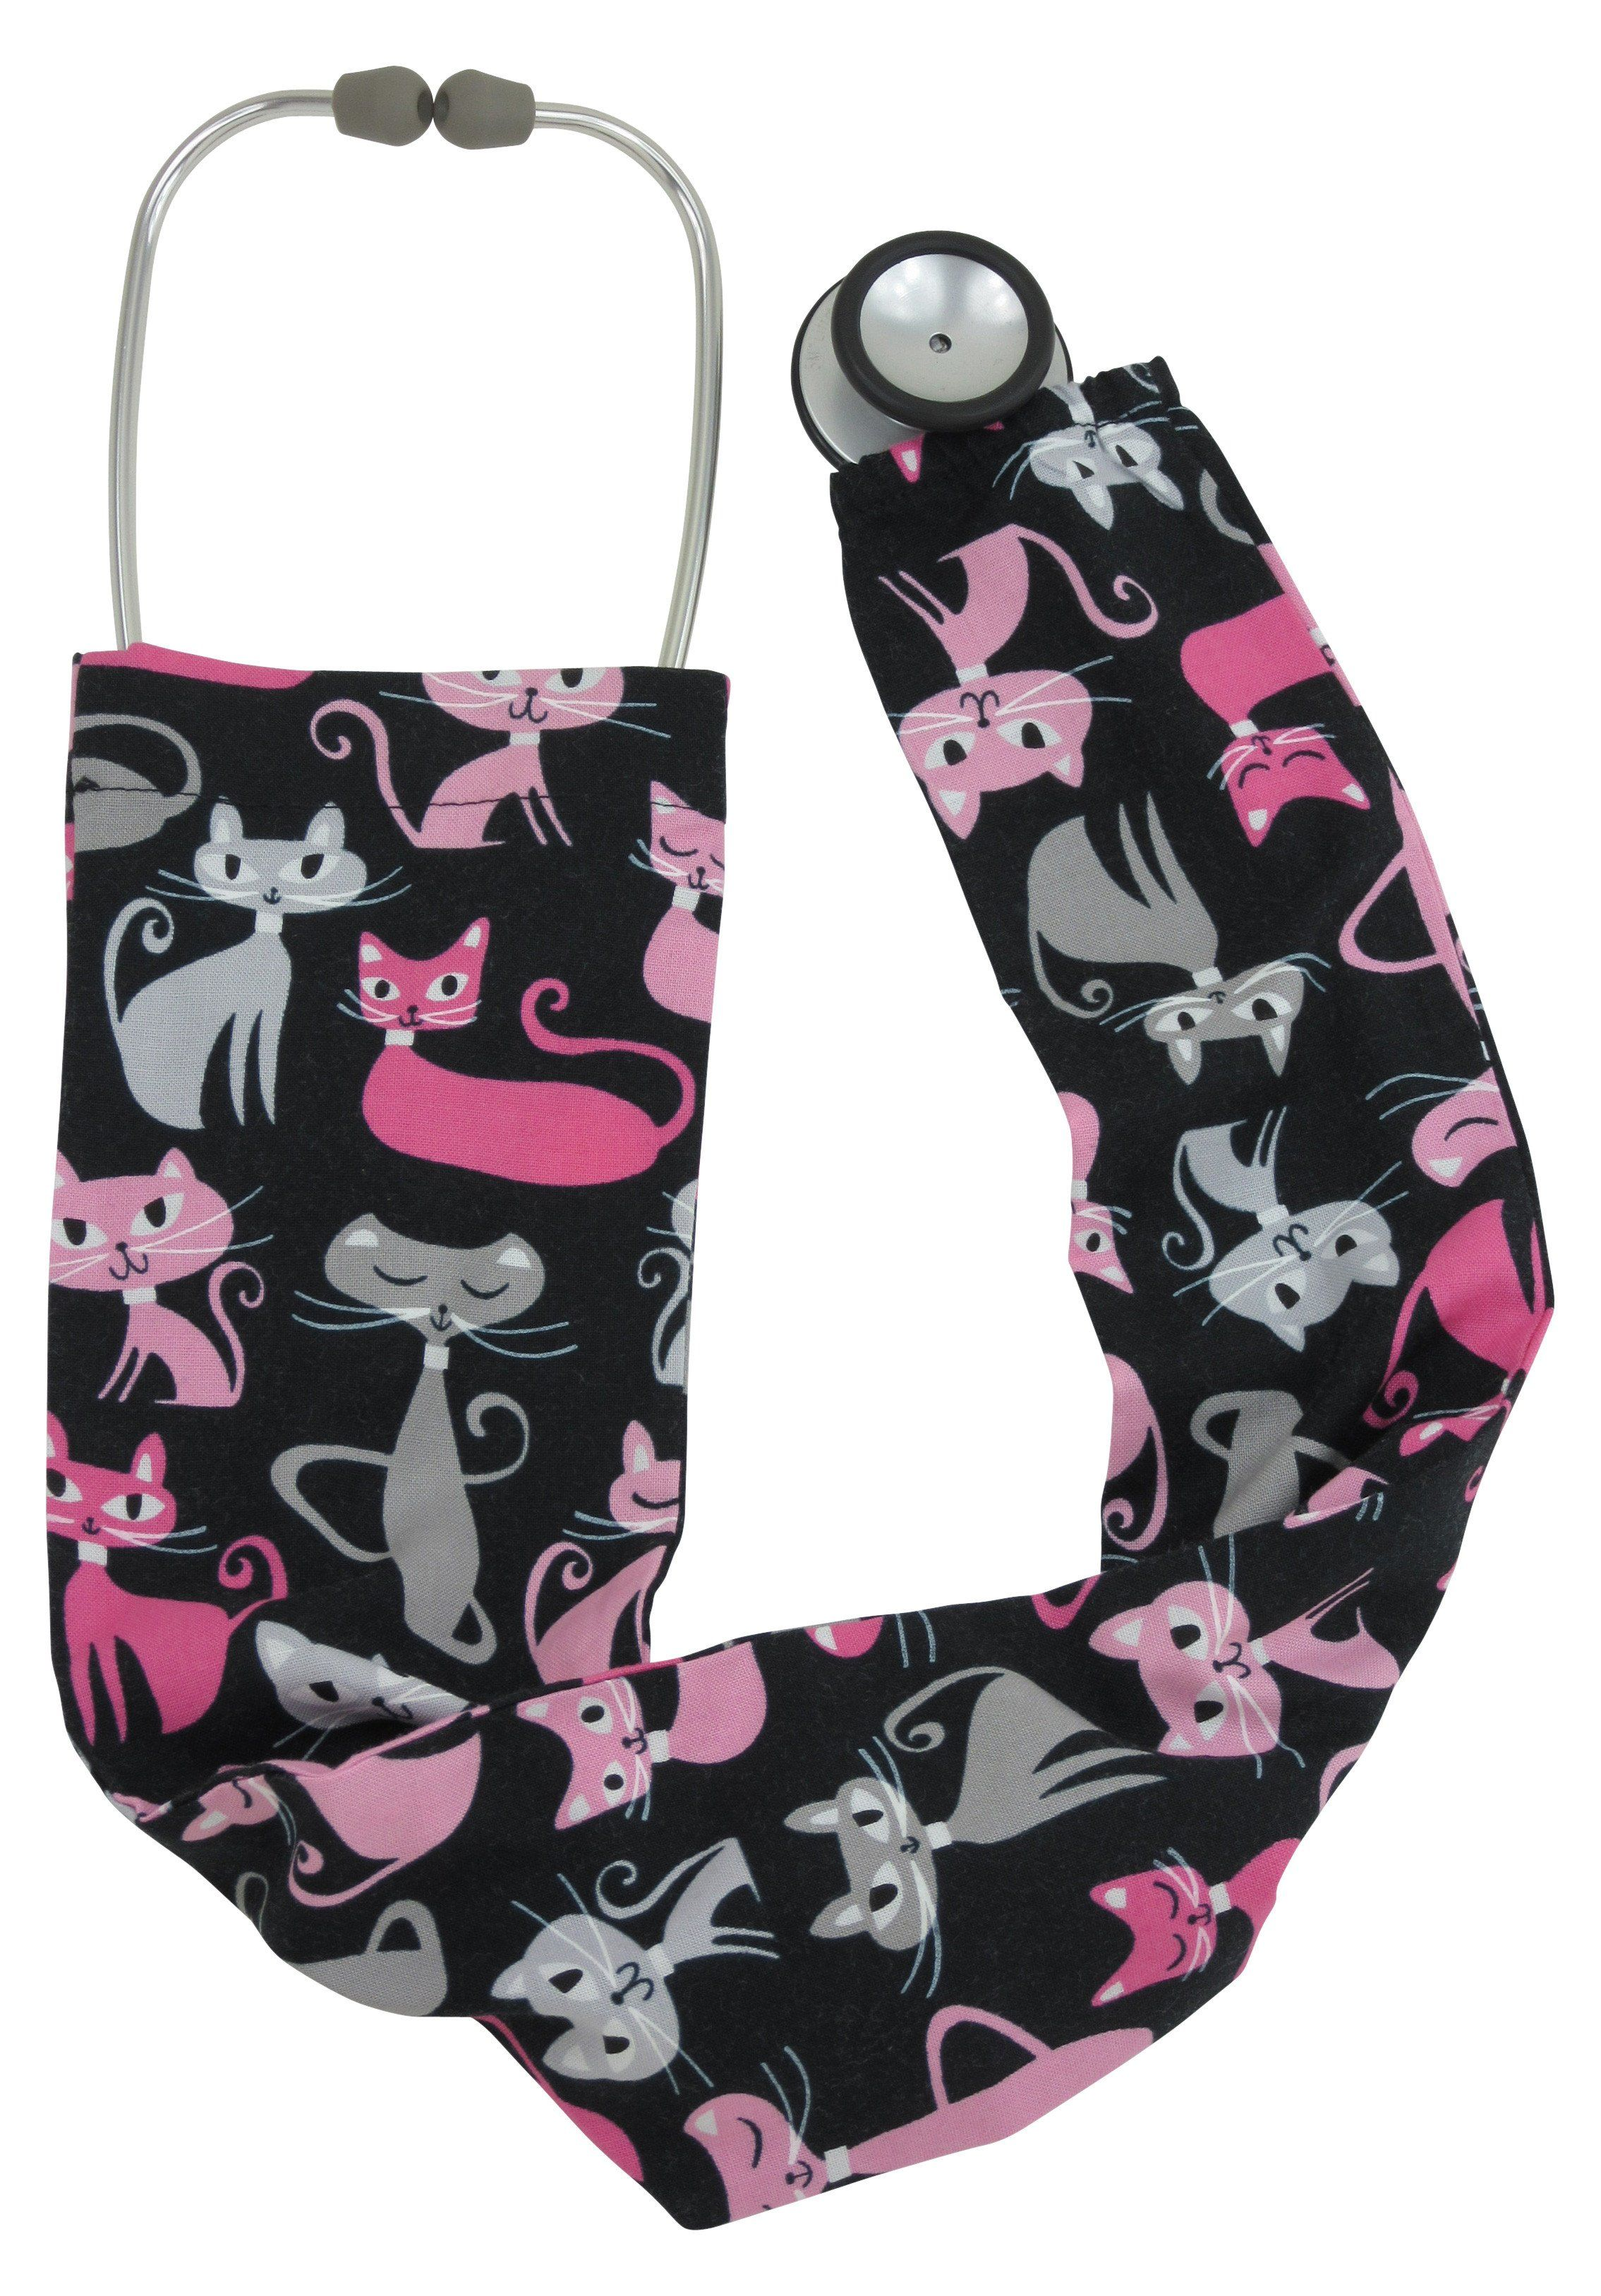 Stethoscope Socks Feline Cats